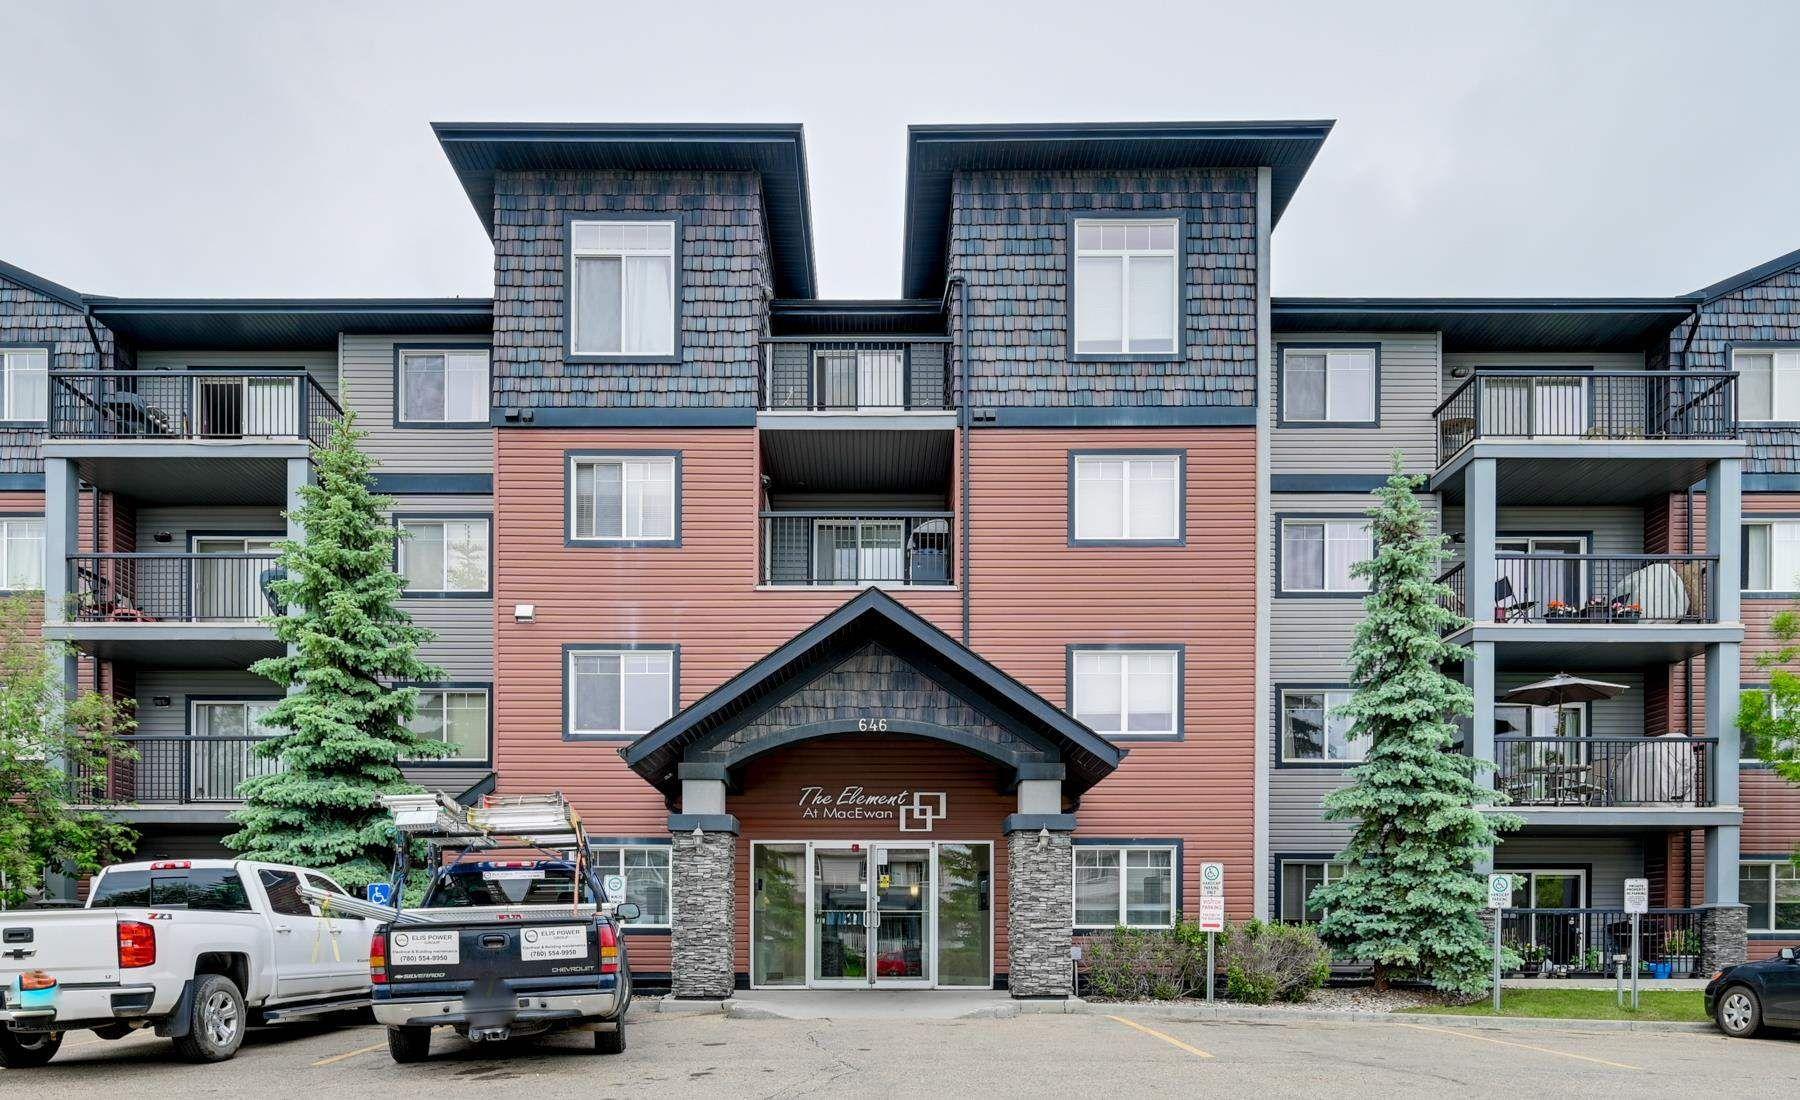 Main Photo: 217 646 MCALLISTER Loop in Edmonton: Zone 55 Condo for sale : MLS®# E4249189